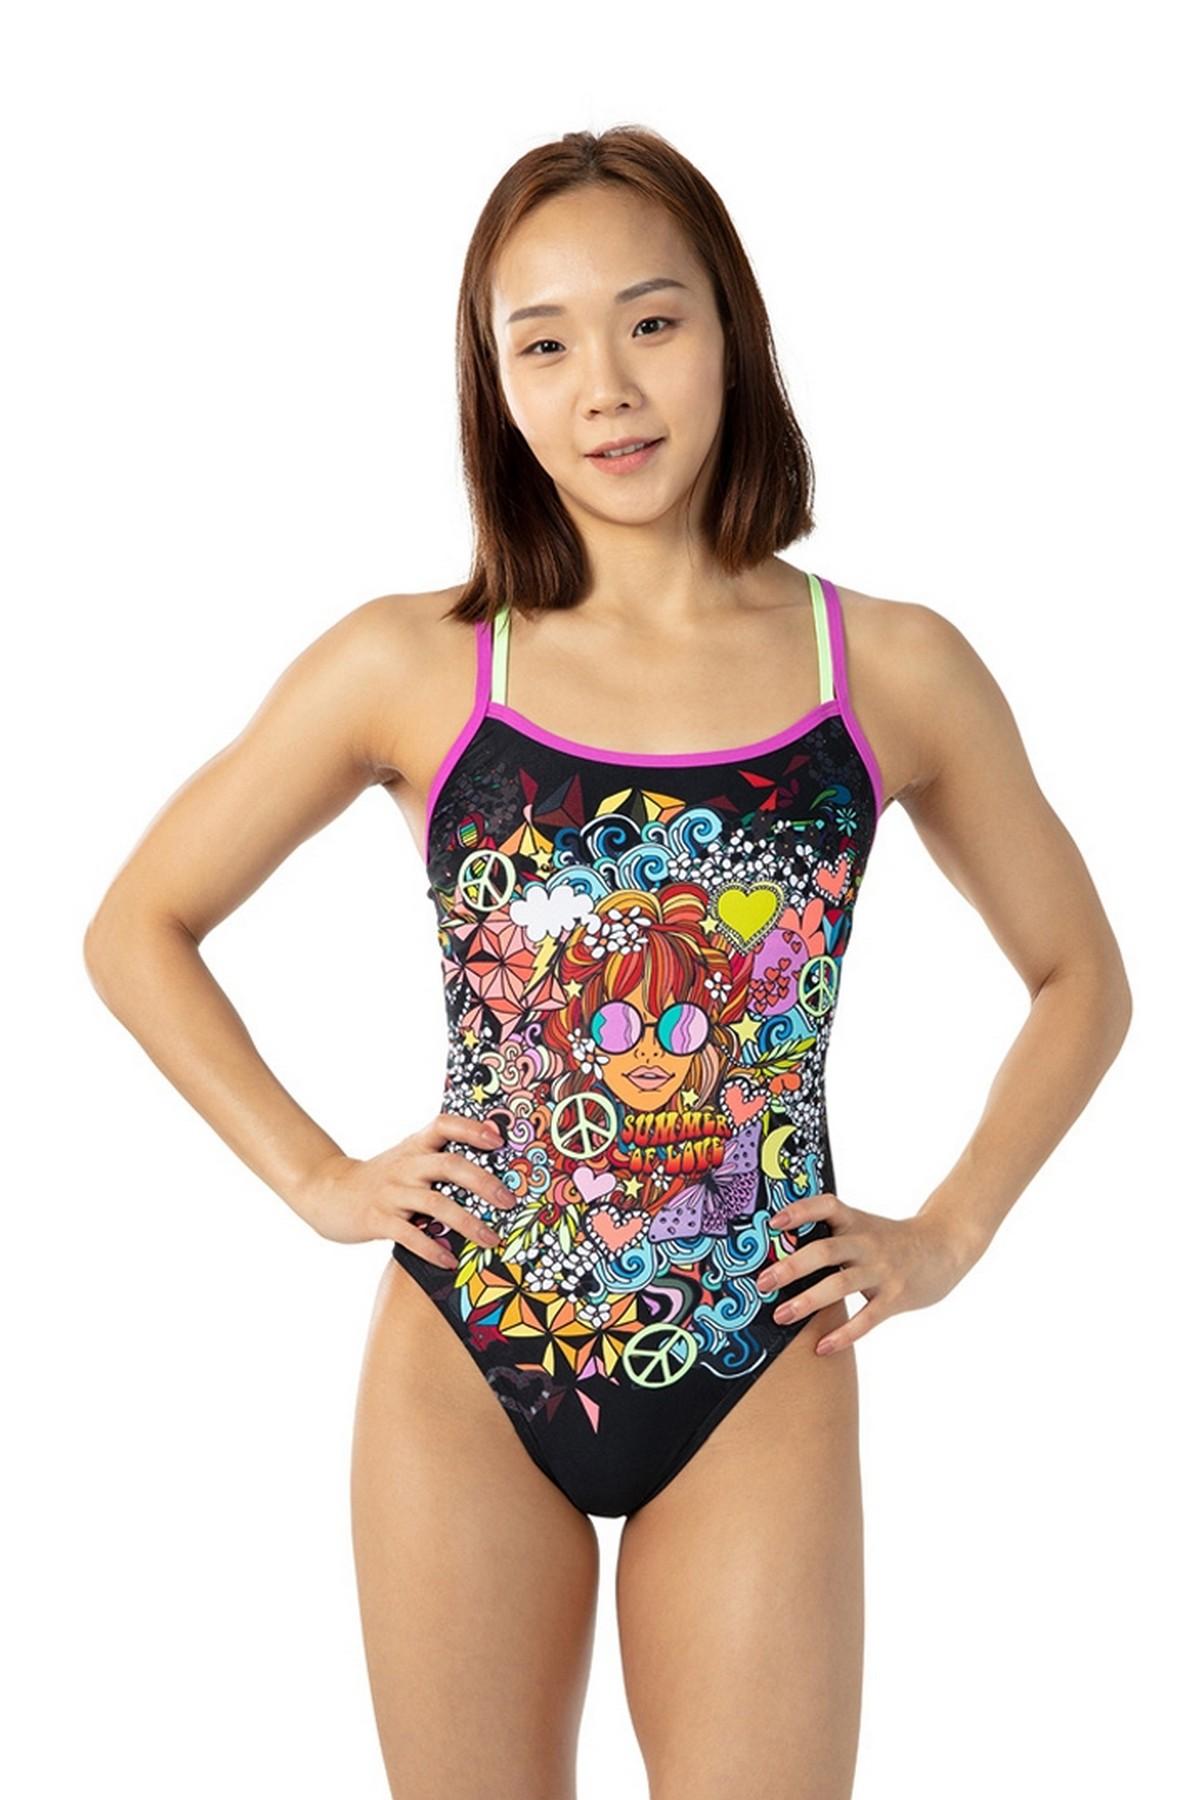 Speedo PLMT XBCK TF Kadın Yüzücü Mayo (8-10626C804)